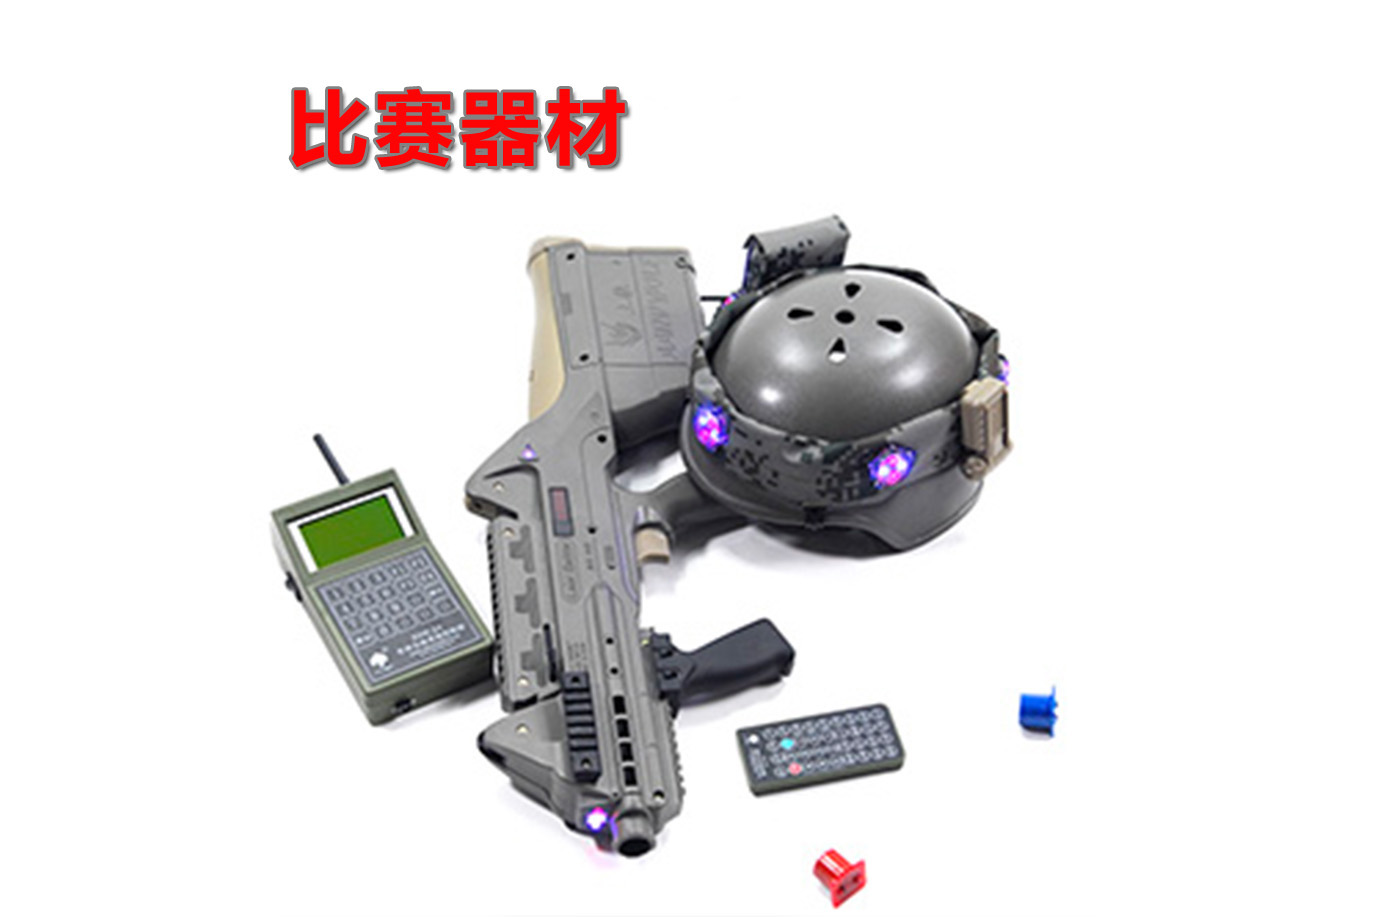 DK2000竞技版野战运动专用器材